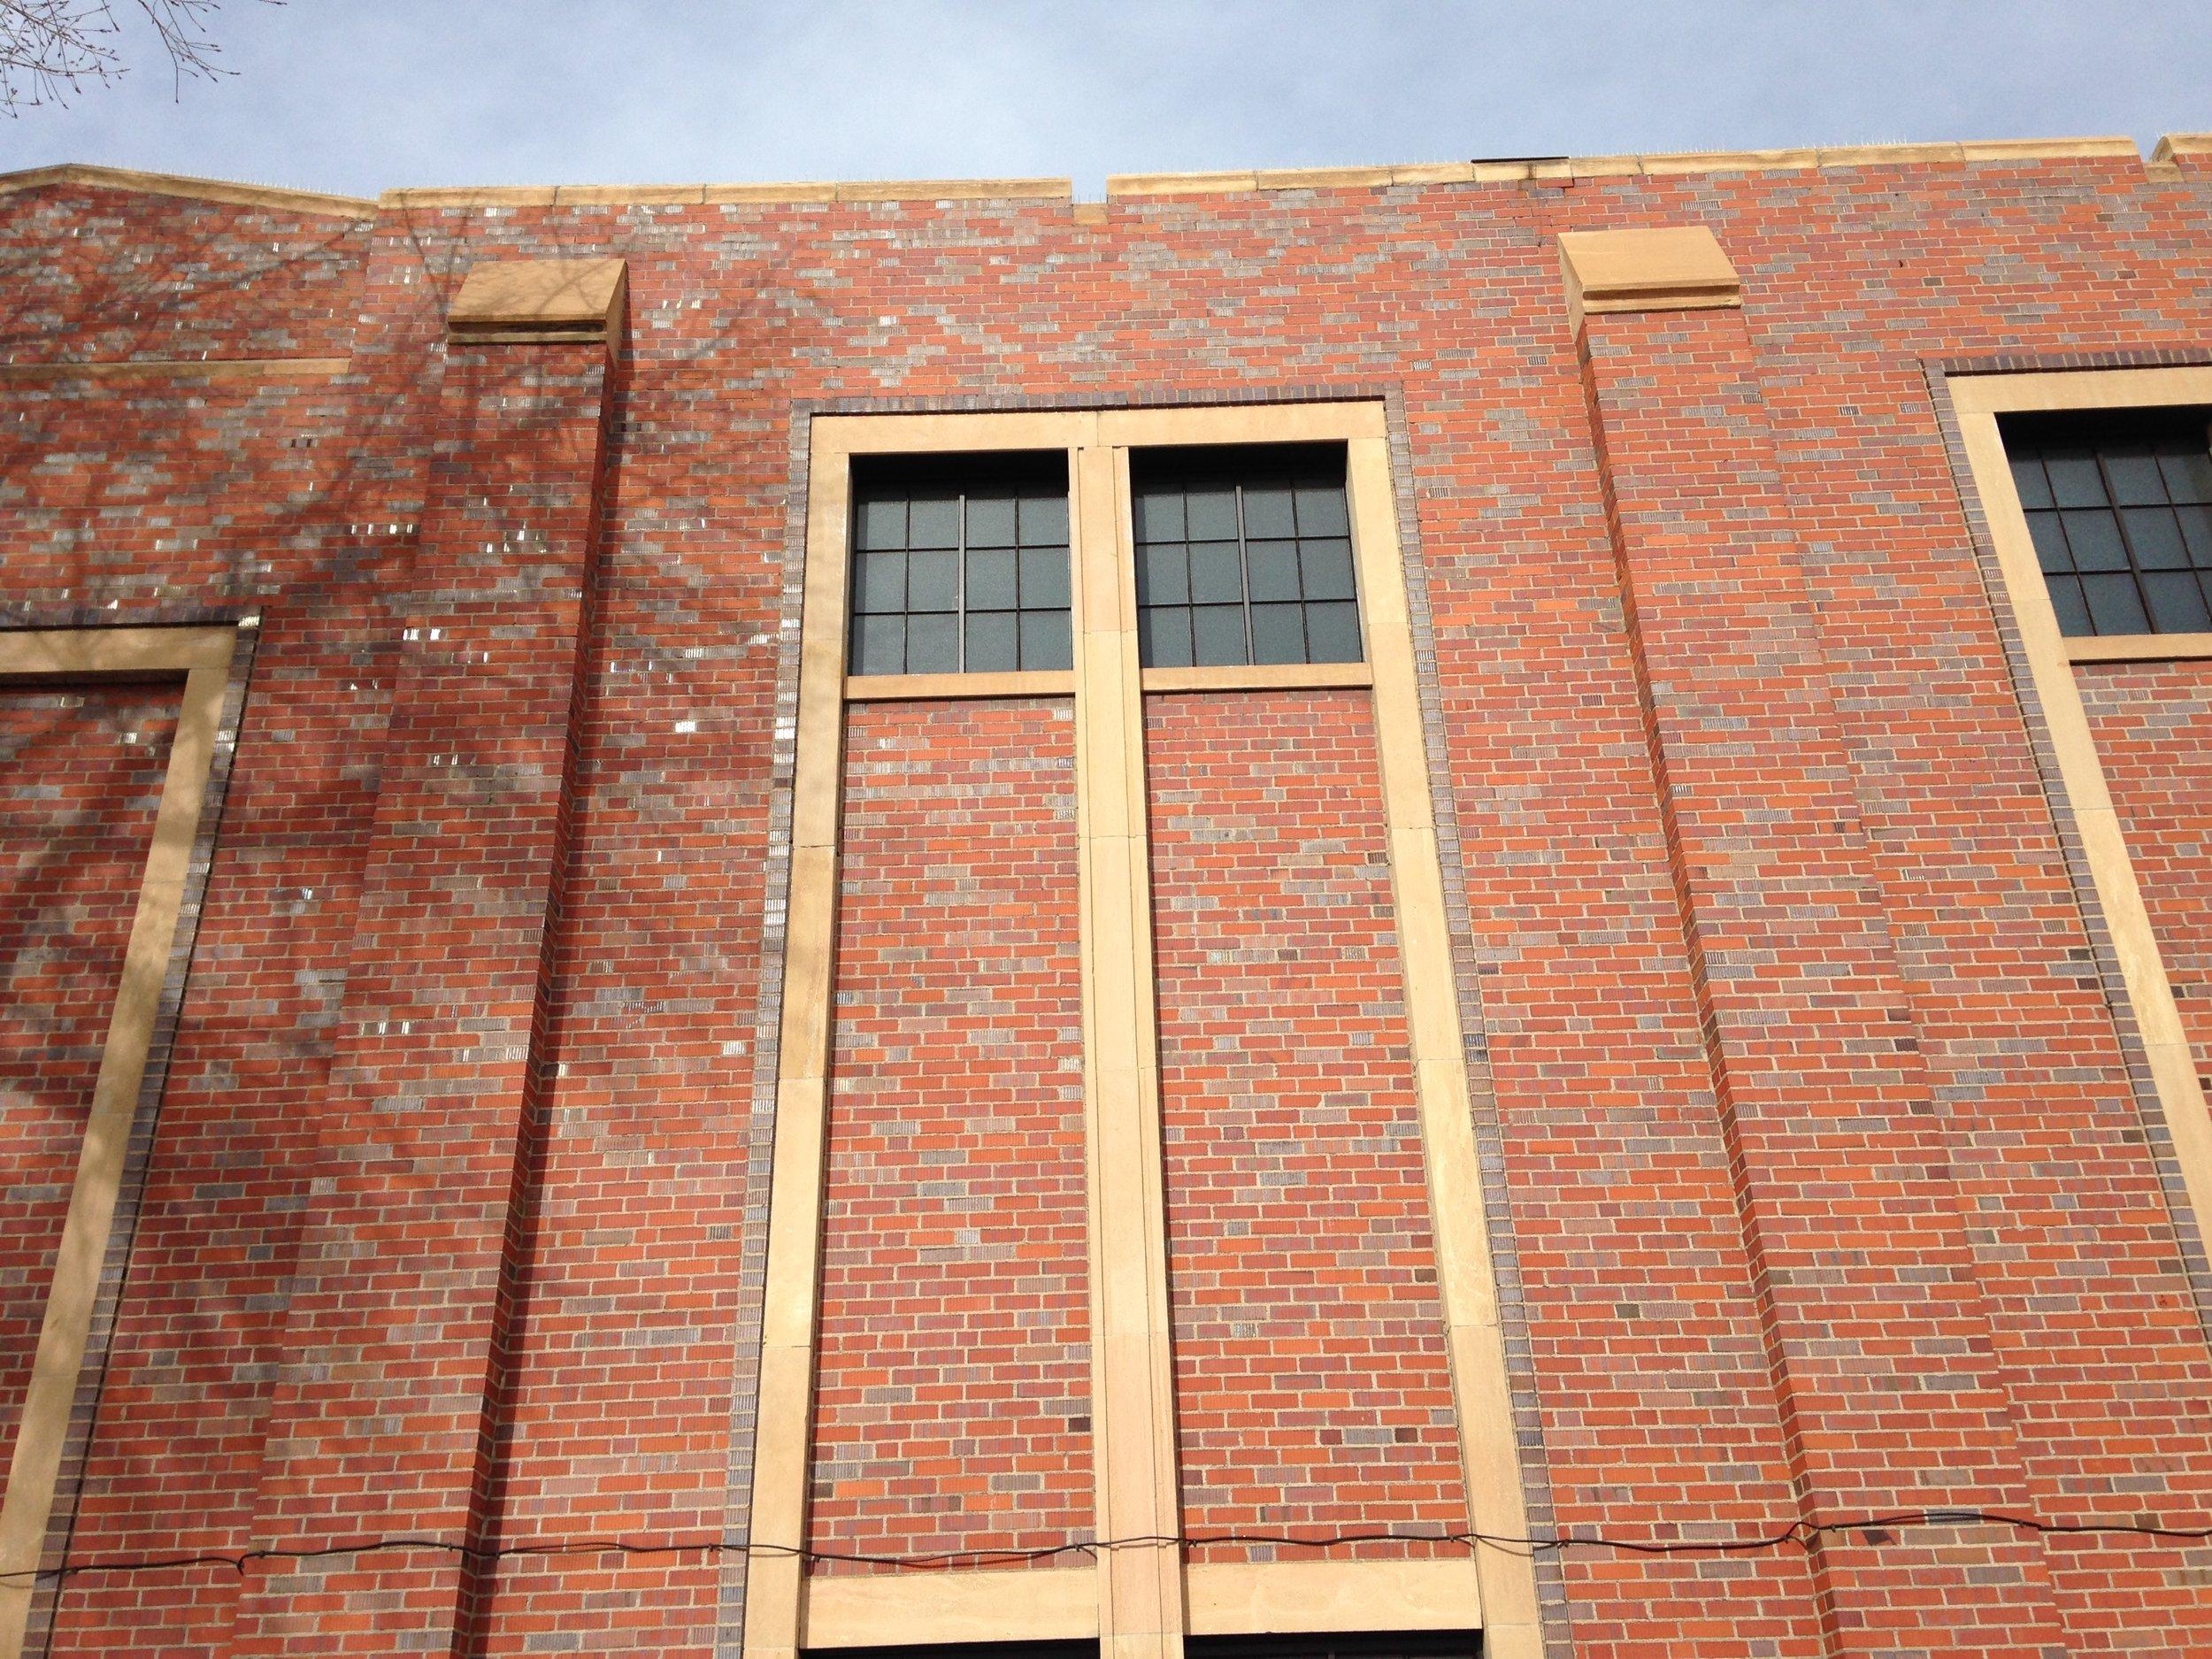 Refurb S Gym windows.JPG